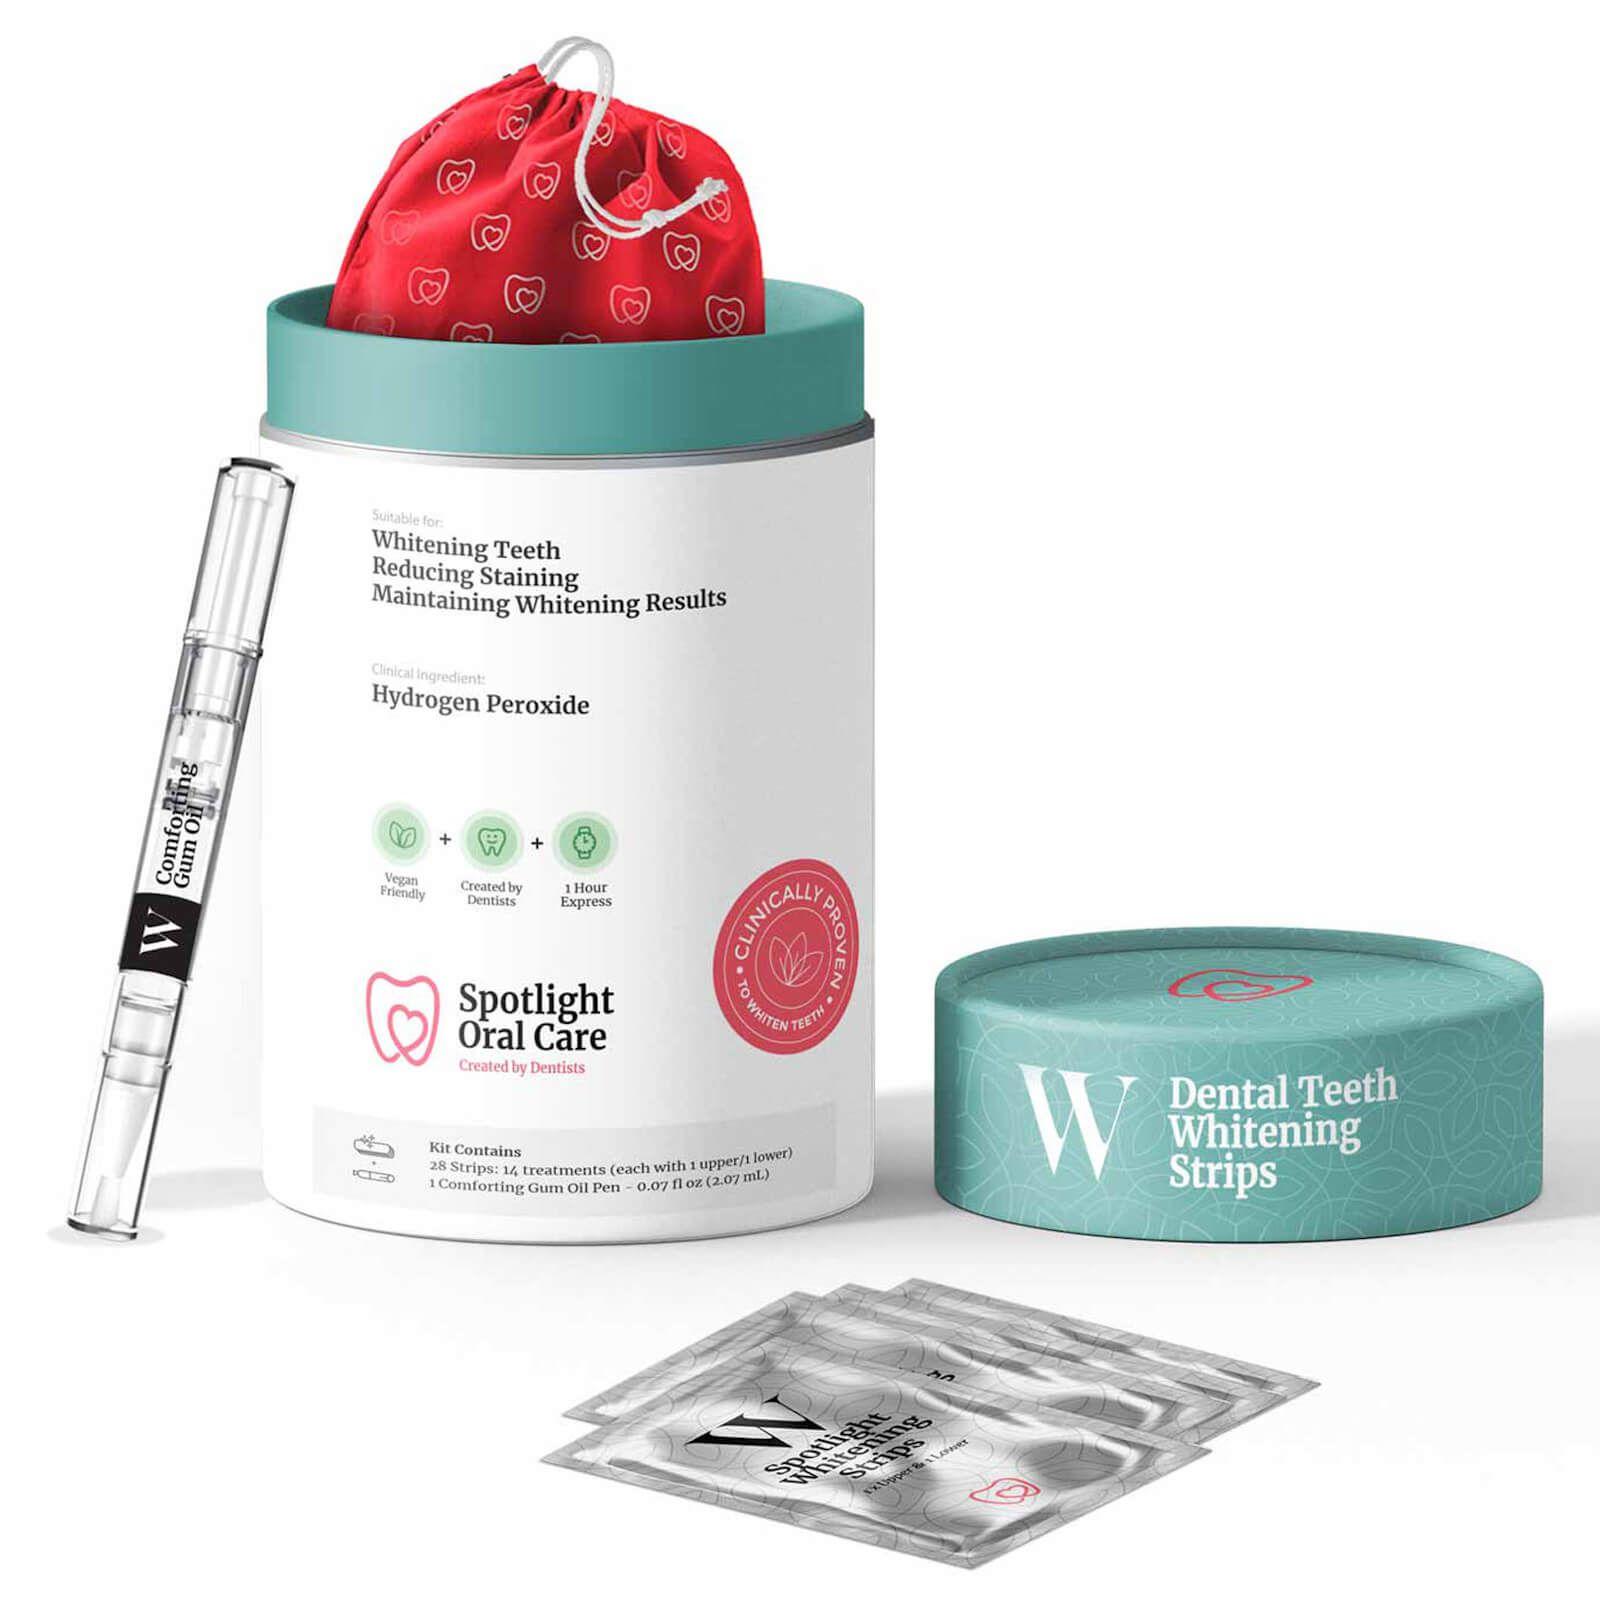 Spotlight Oral Care Whitening System